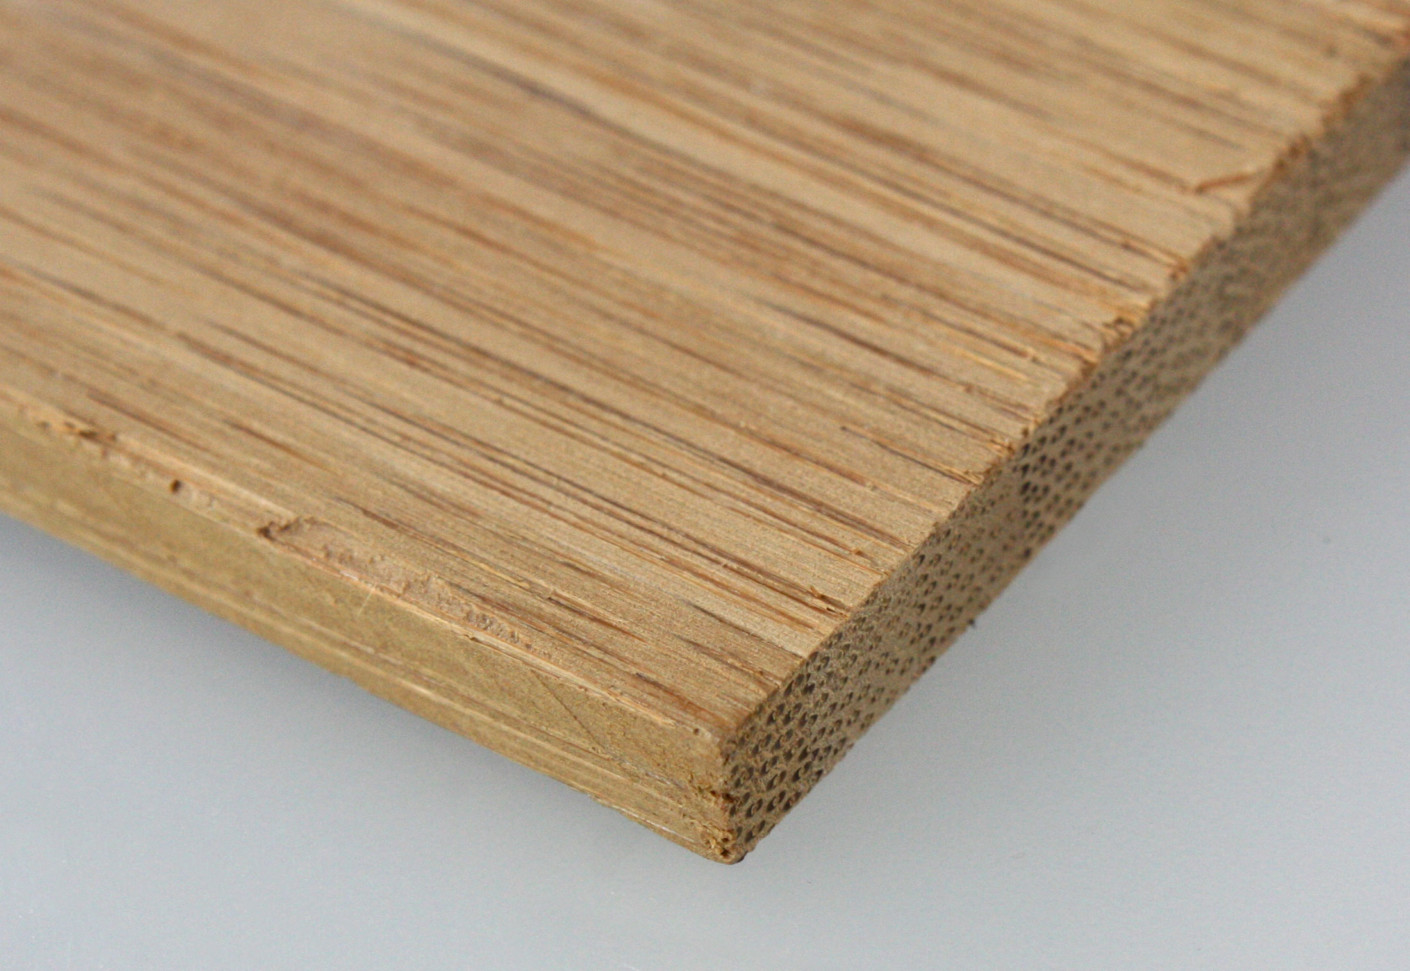 fabulous bambus holz platten &dr33 – startupjobsfa